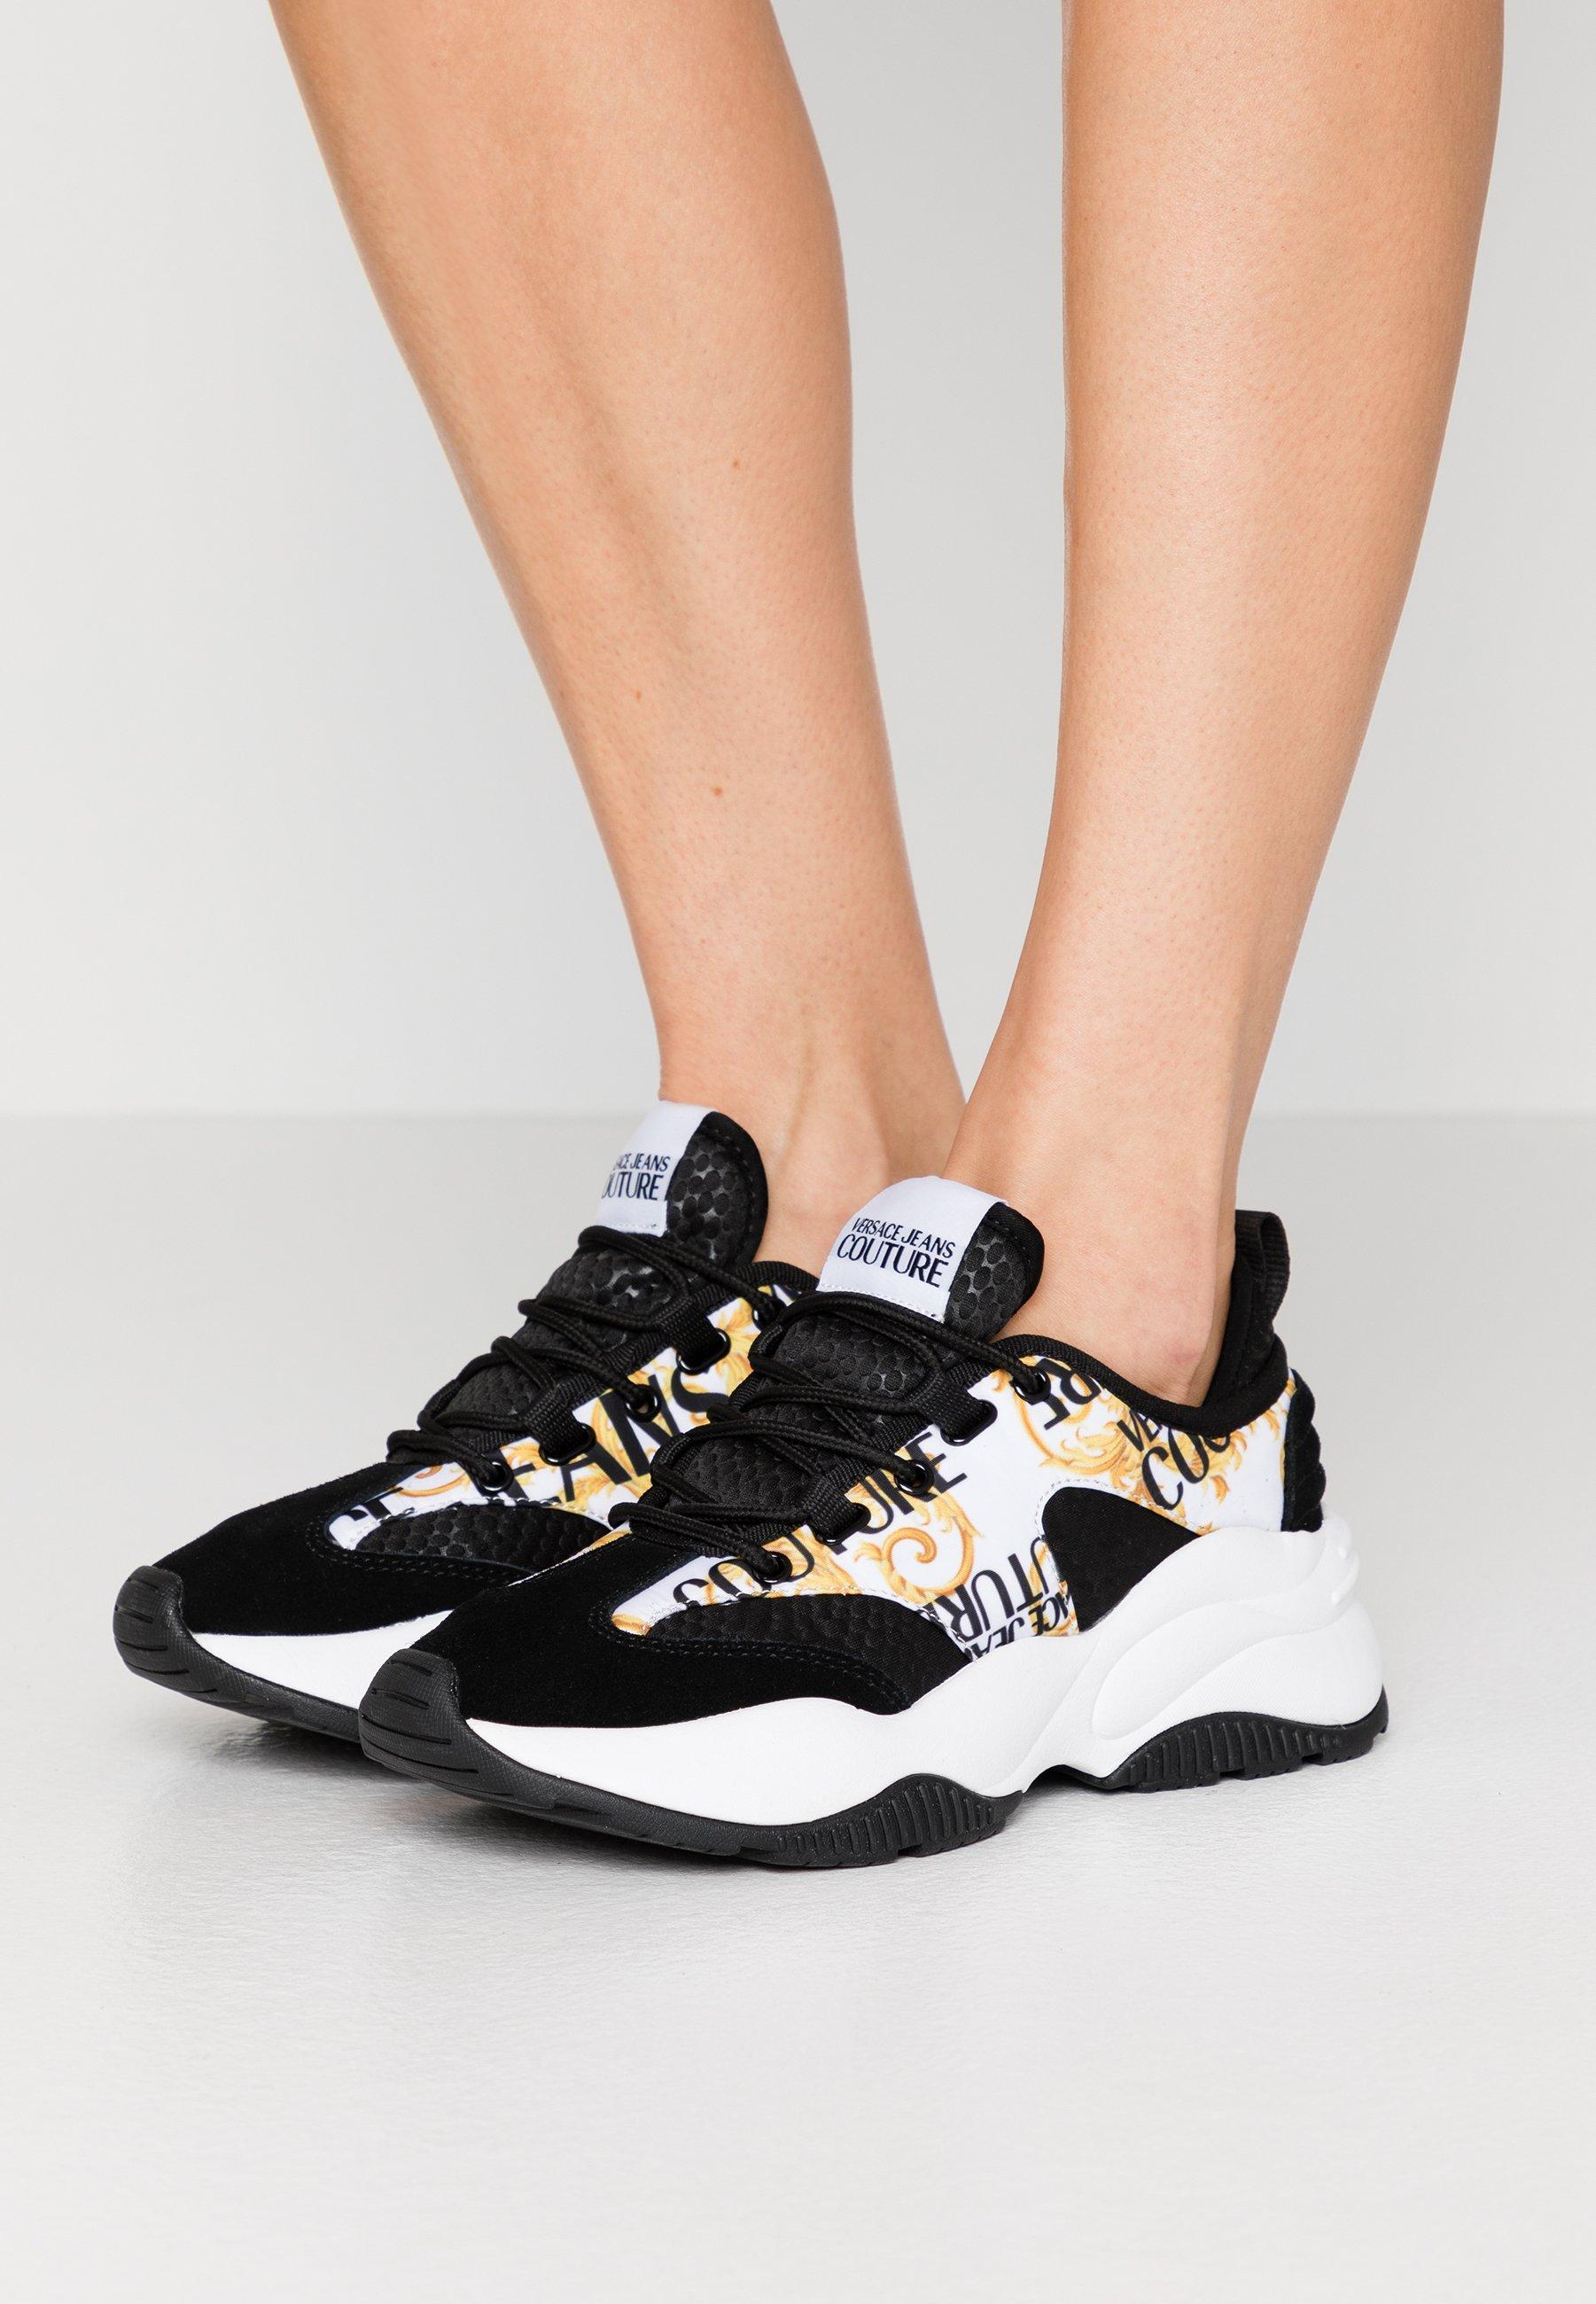 Baskets Versace : Achetez jusqu'à −50% | Stylight